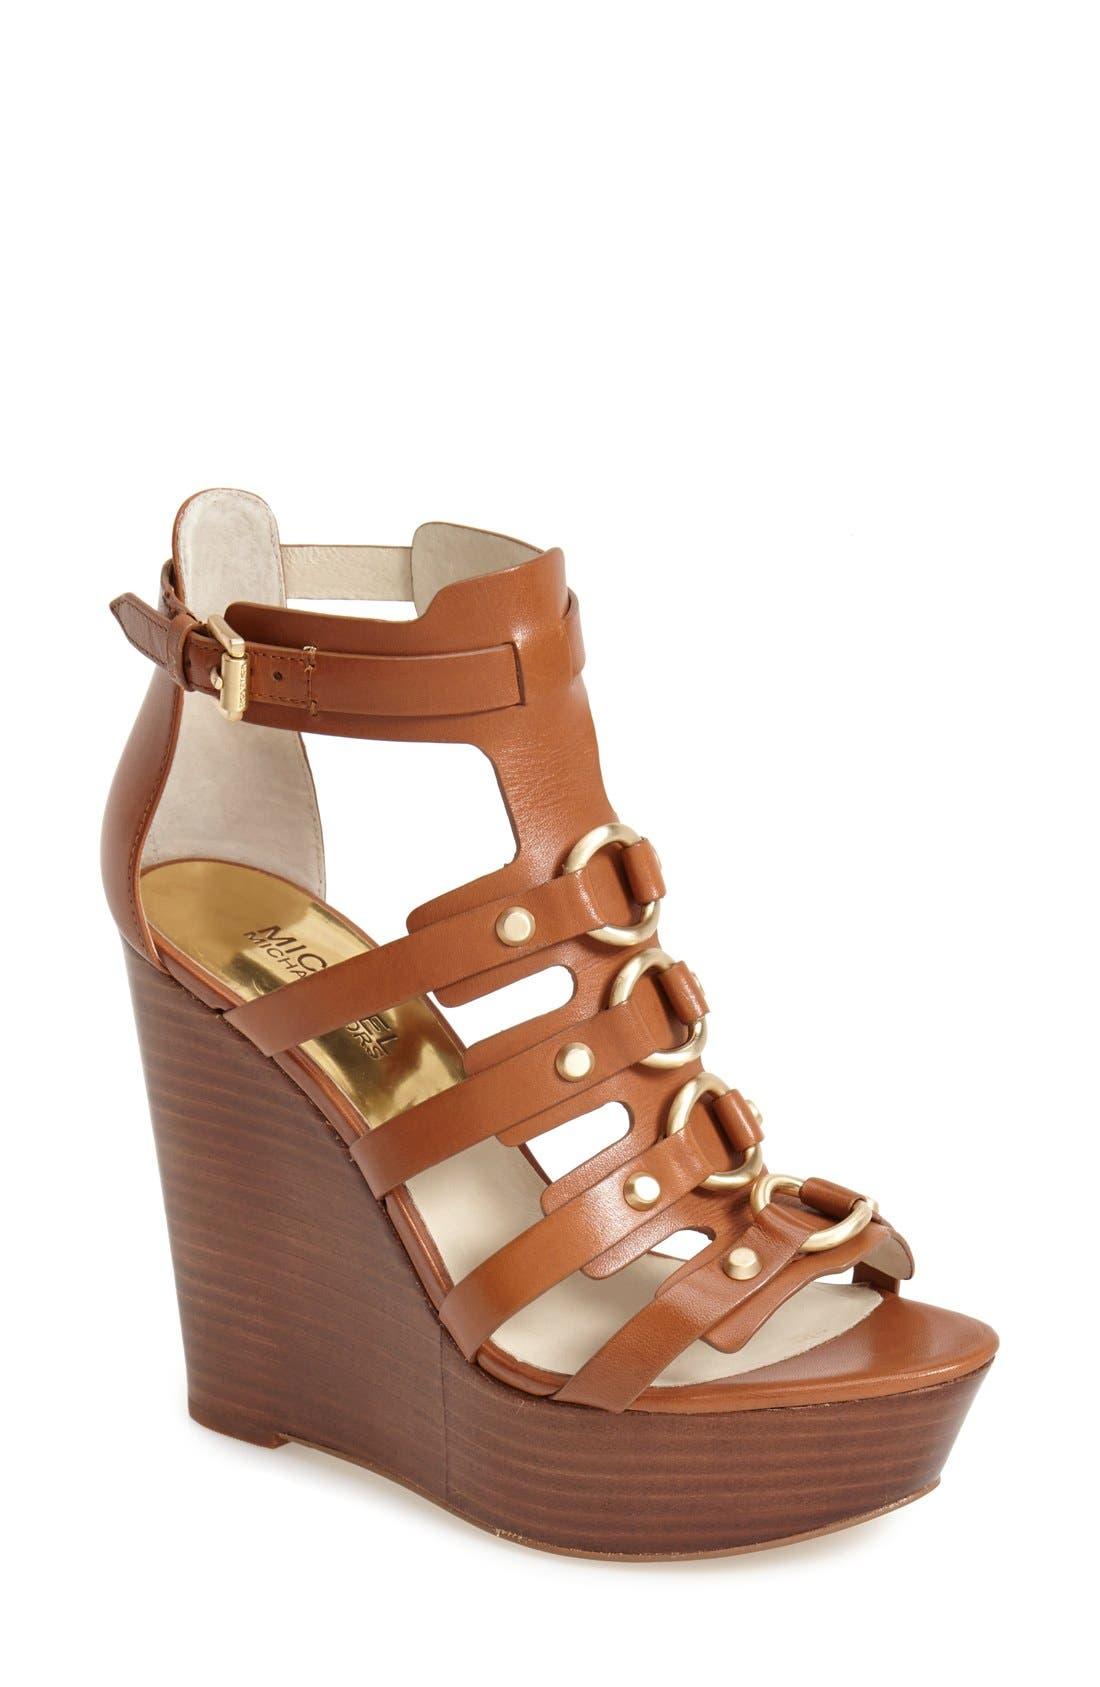 Main Image - MICHAEL Michael Kors 'Nadine' Platform Wedge Sandal (Women)